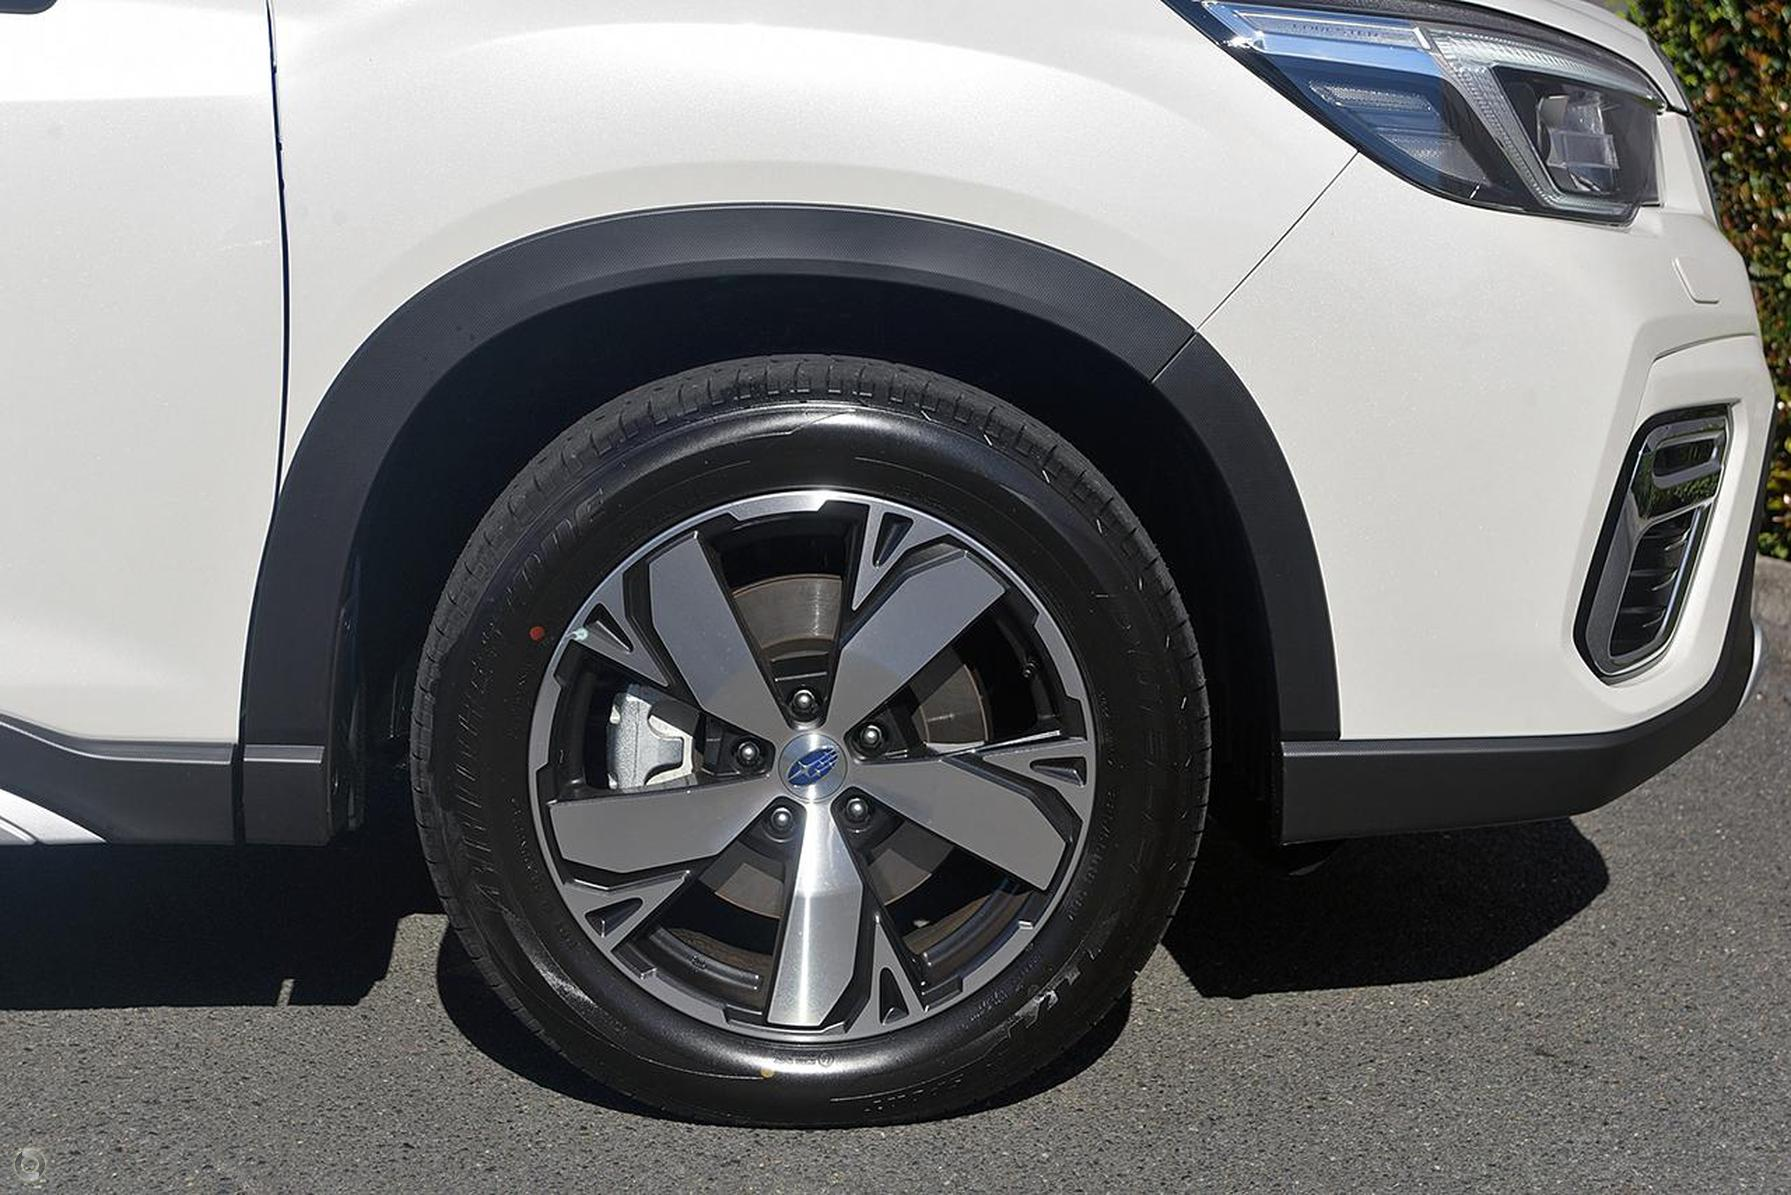 2019 Subaru Forester 2 5i-S S5 - von Bibra